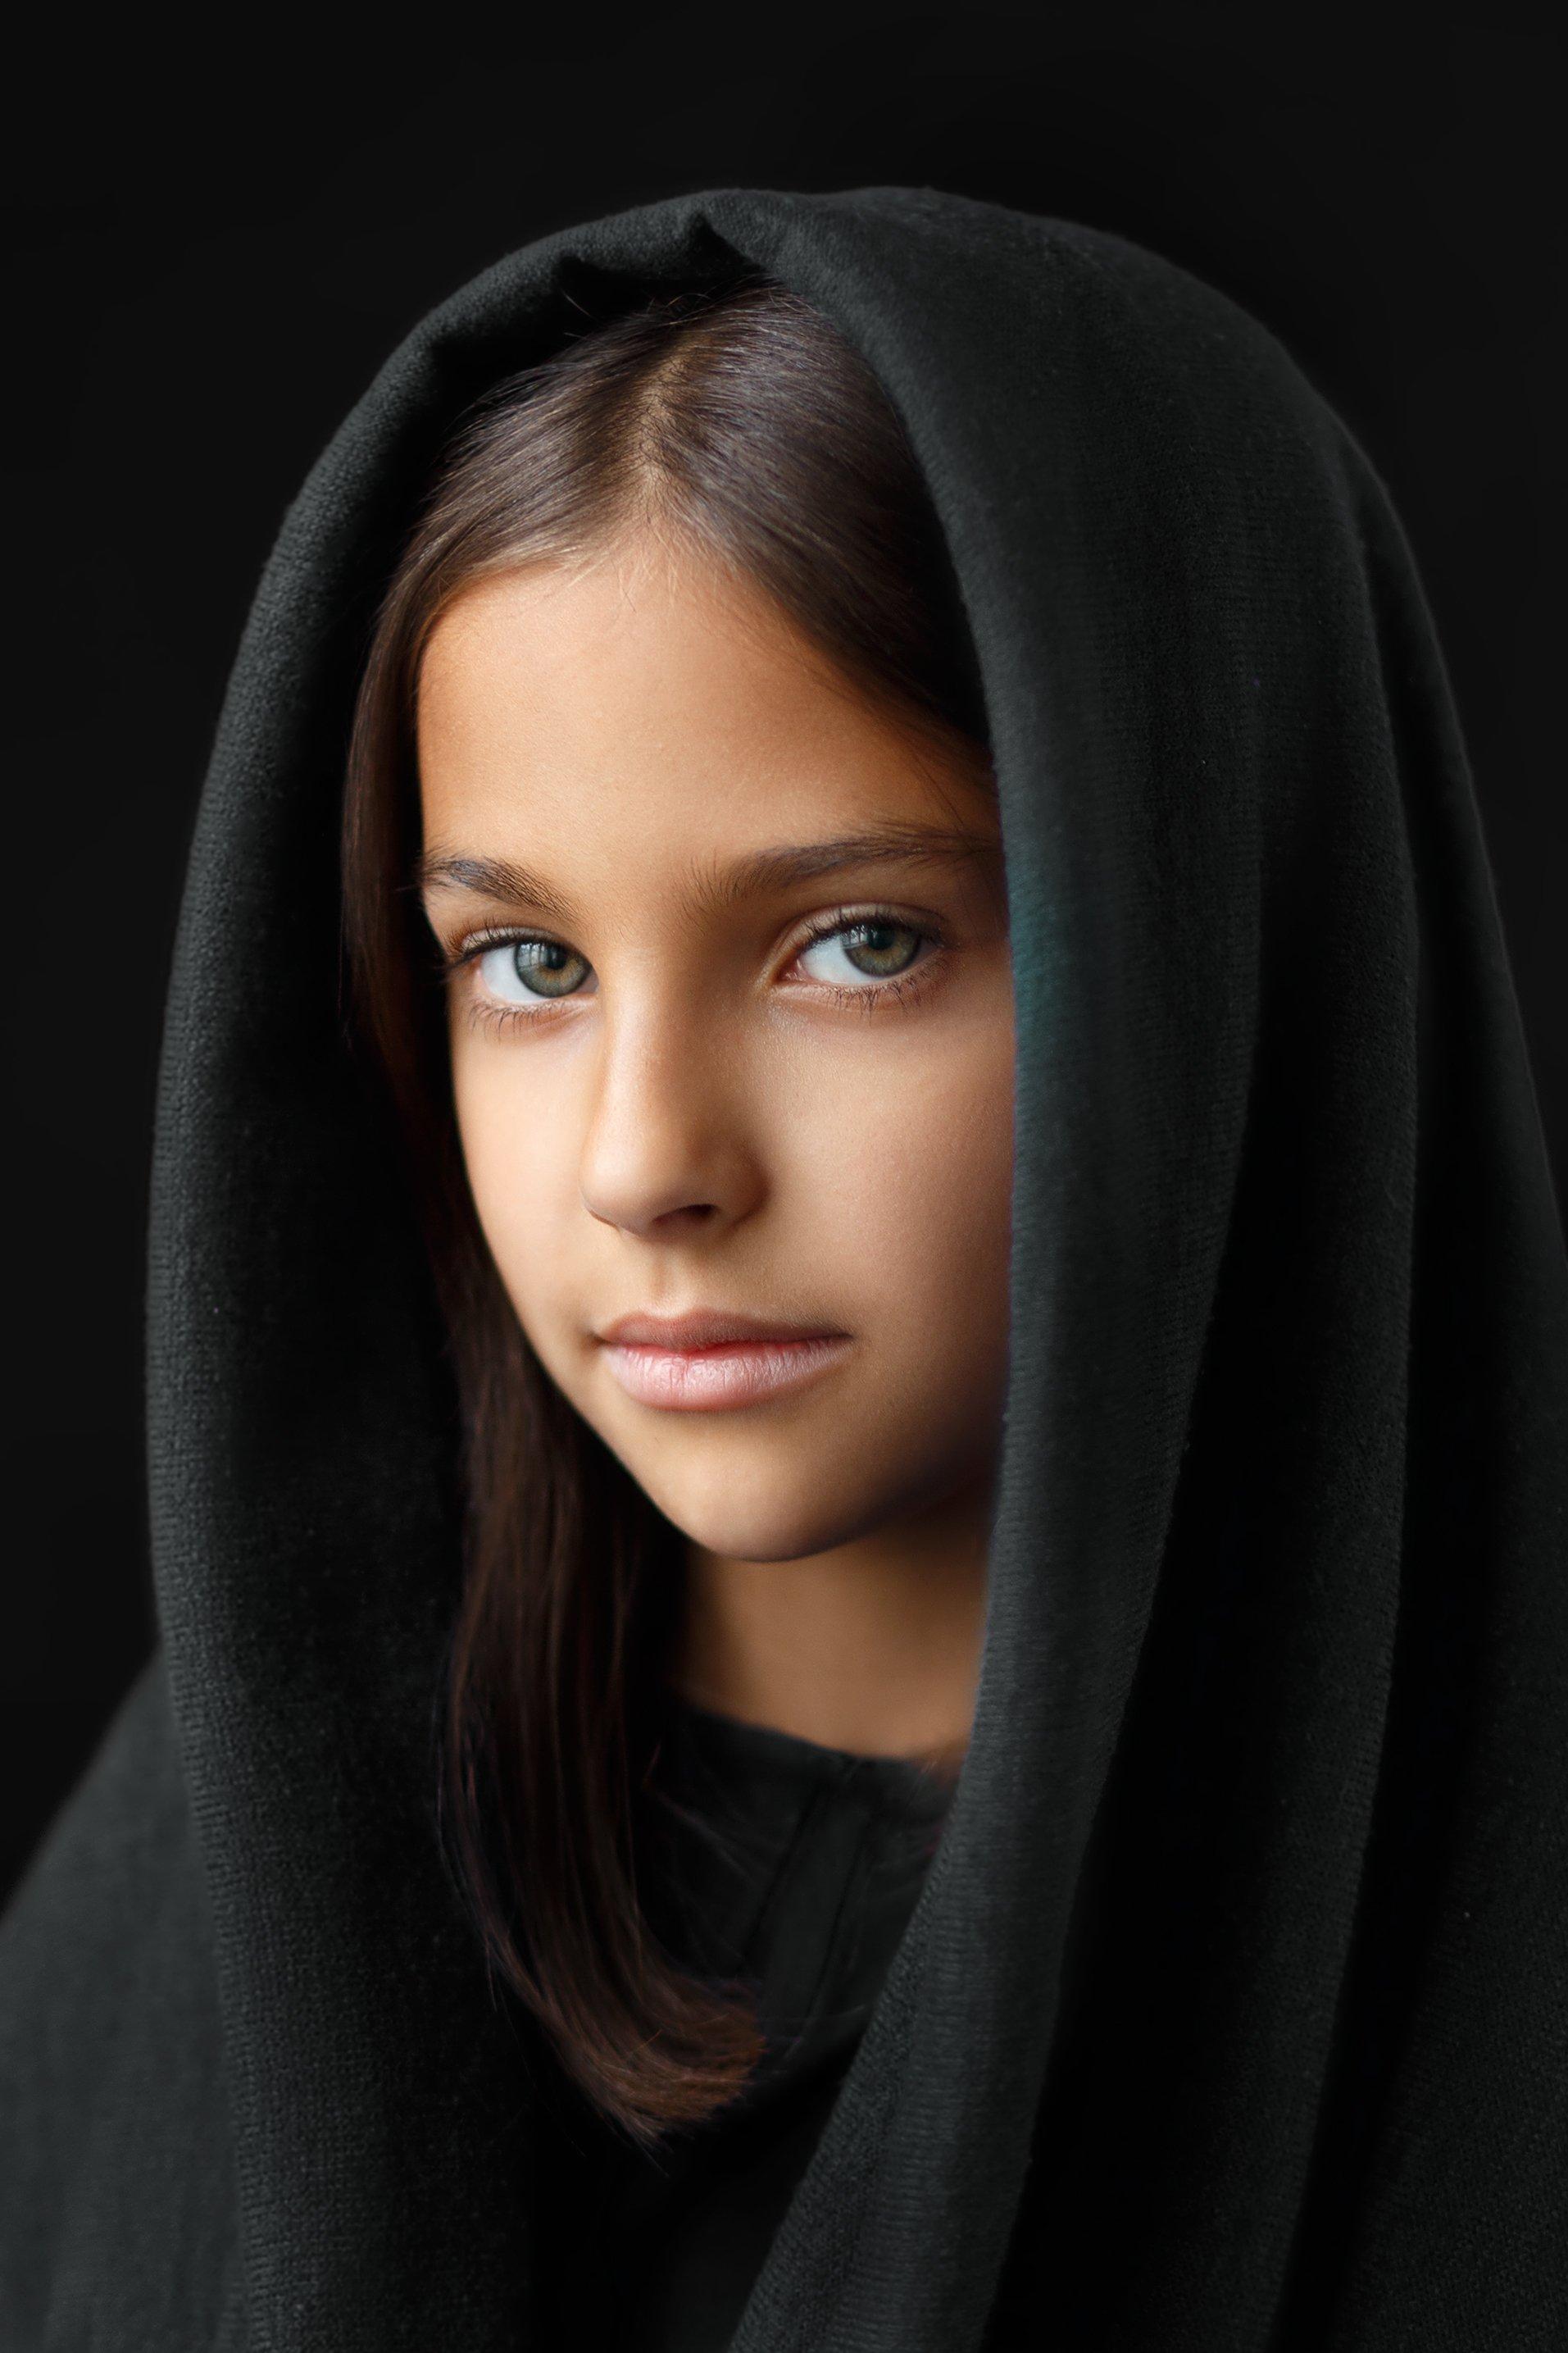 ребенок портрет, Алексей Баталов